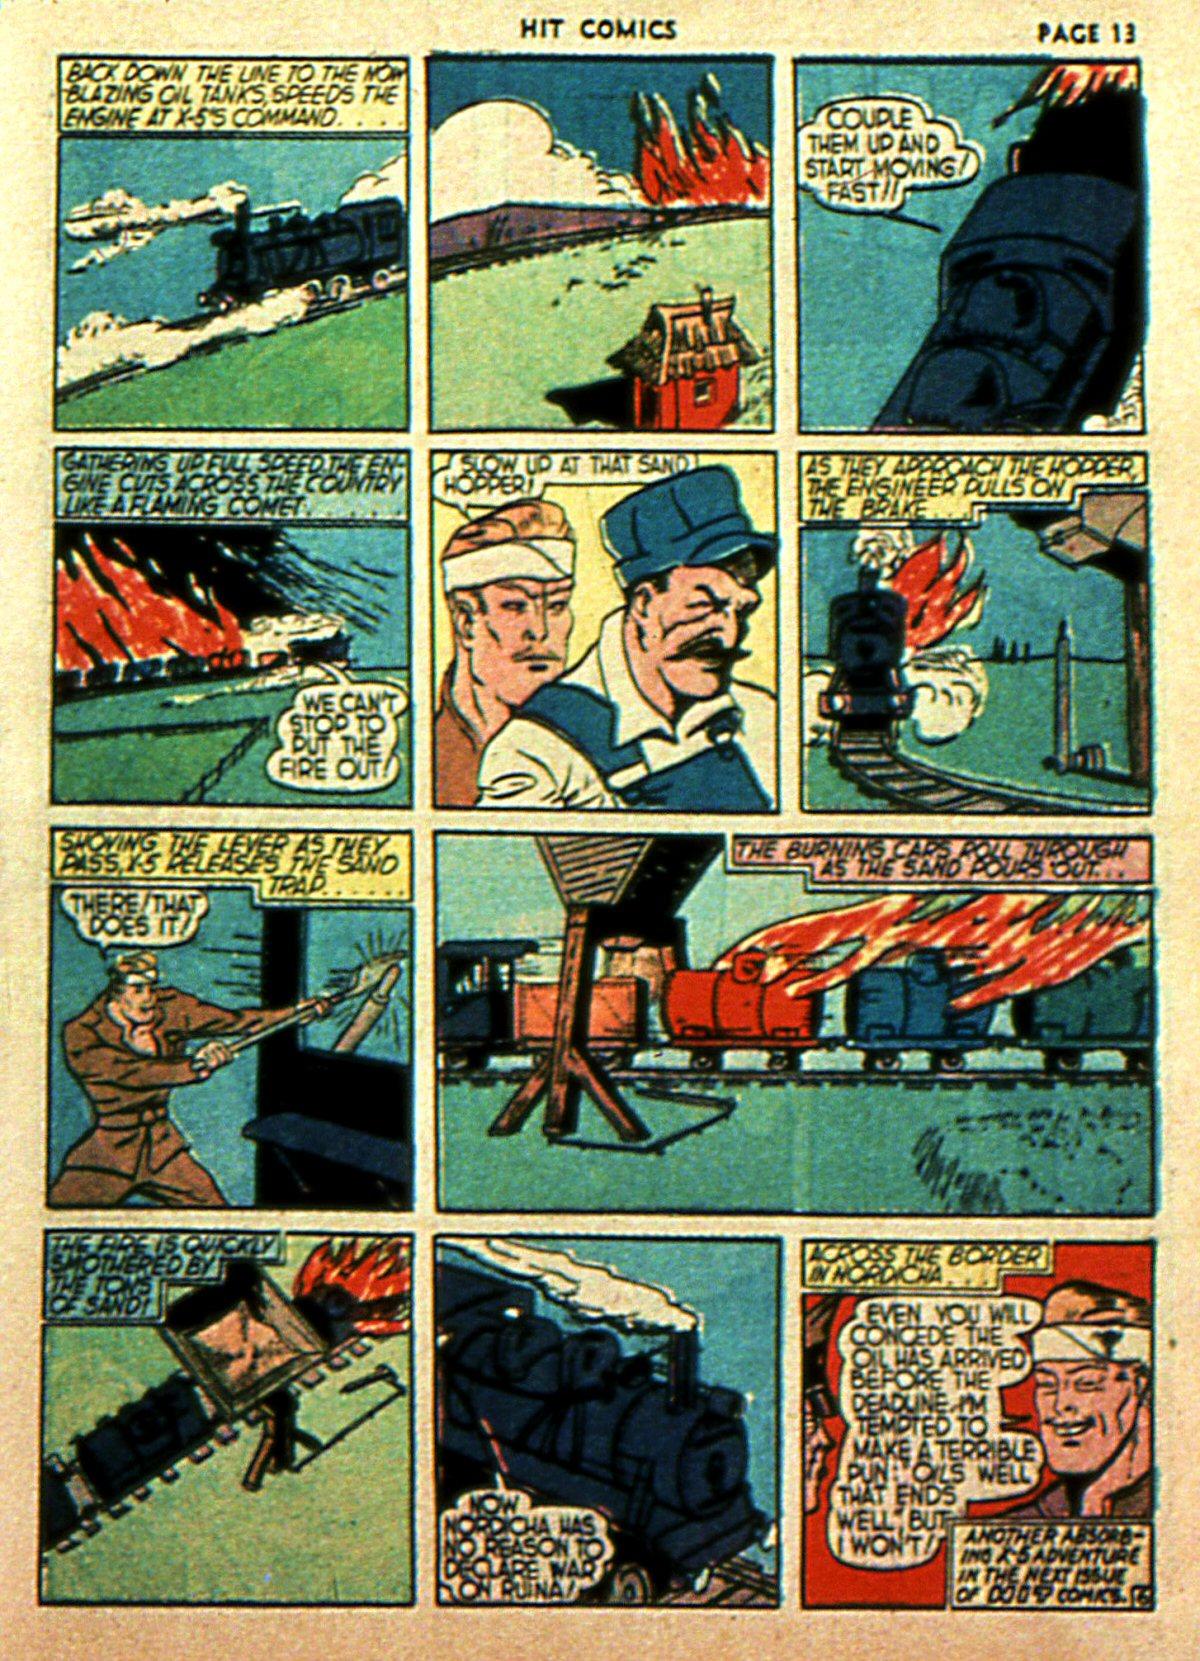 Read online Hit Comics comic -  Issue #2 - 15